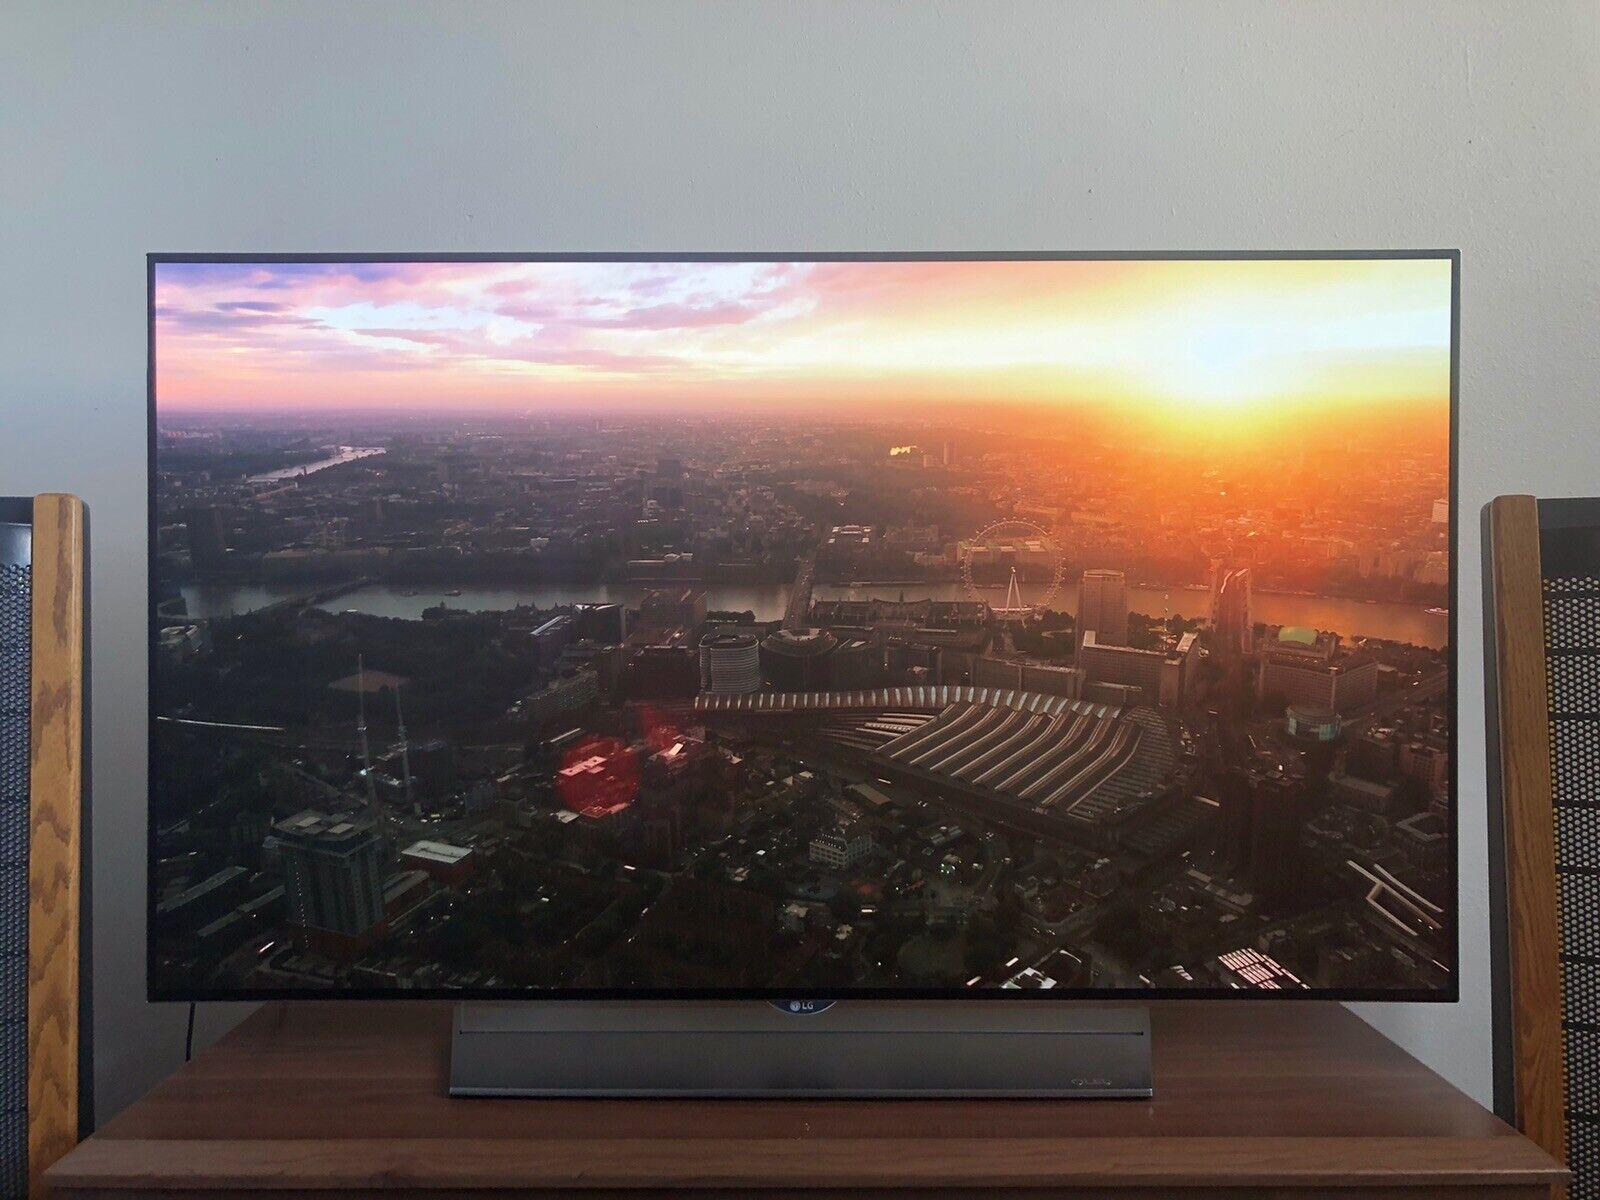 Lg 4K UHD OLED Tv. Buy it now for 1500.00